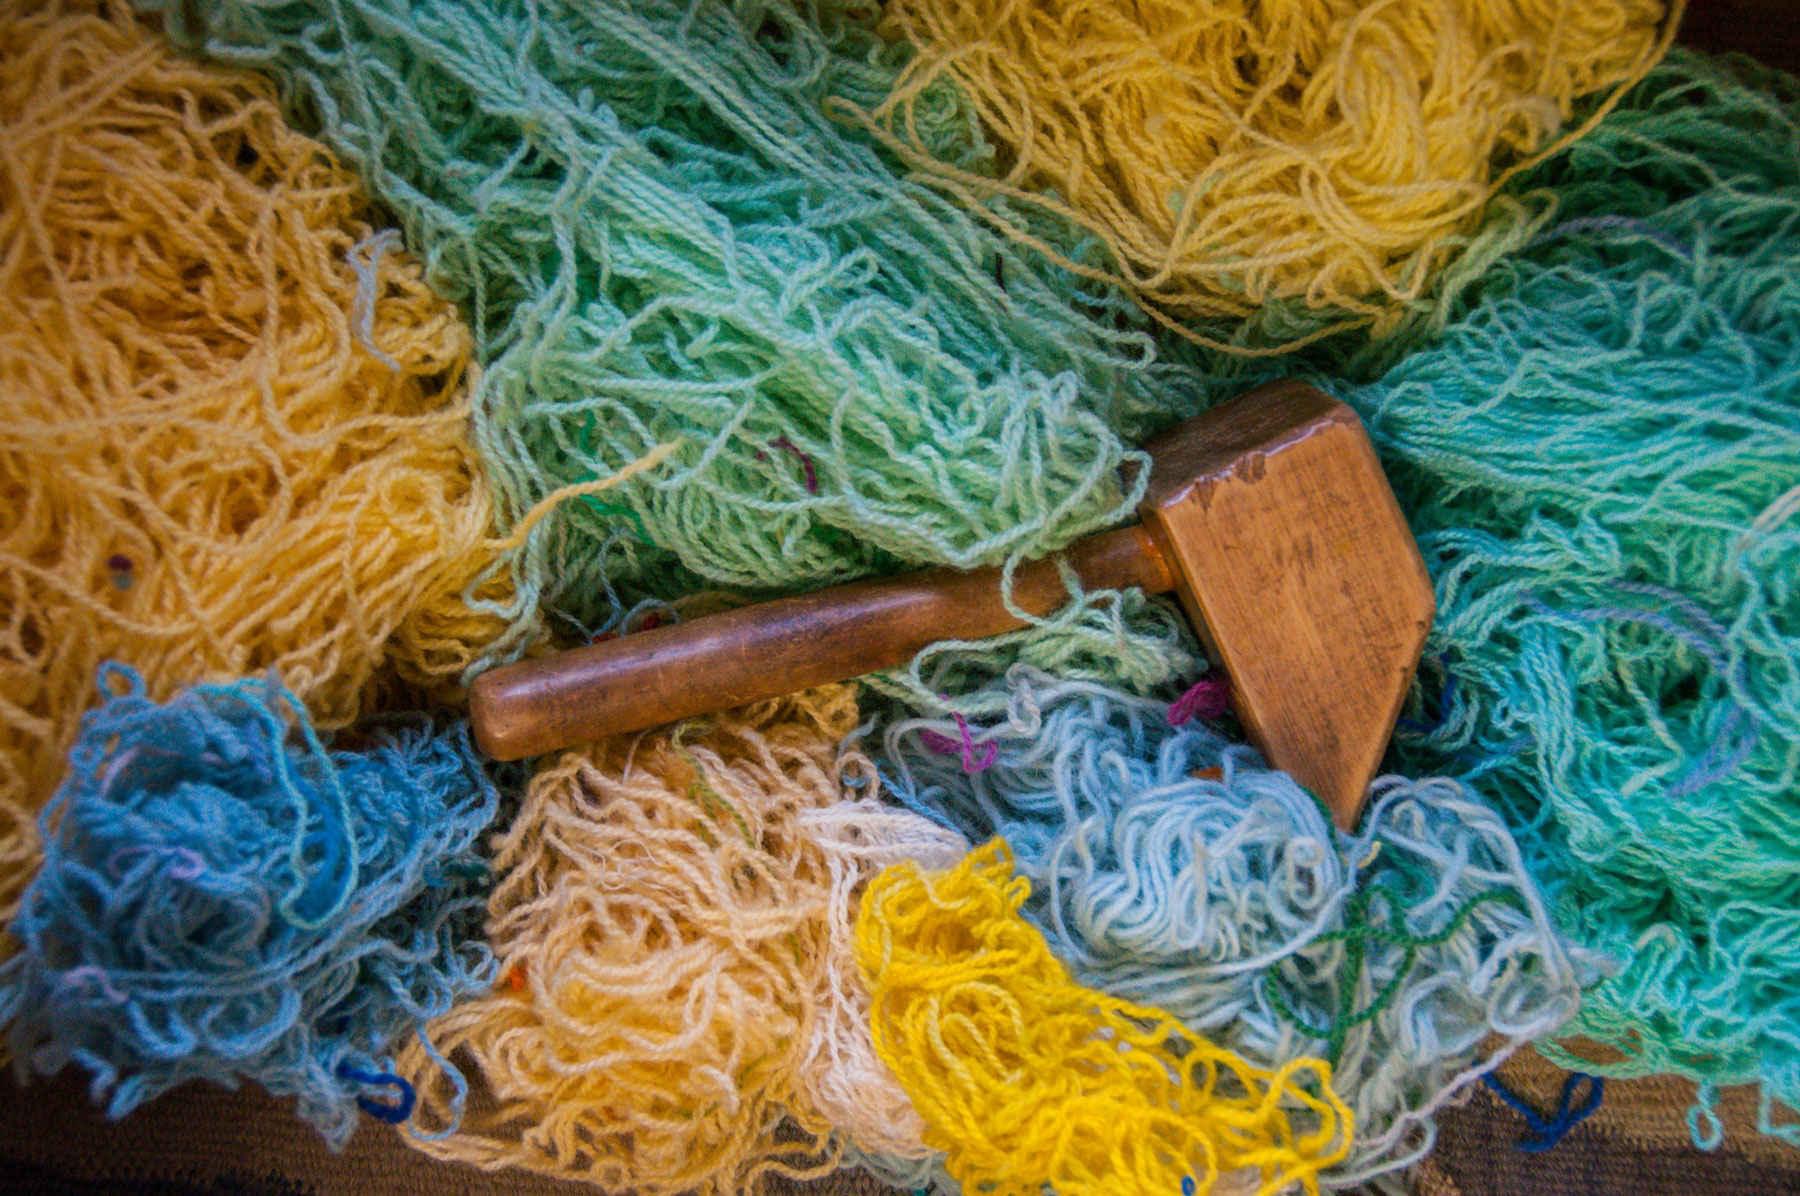 Reshetylivka. Revival of Carpet Manufacturing